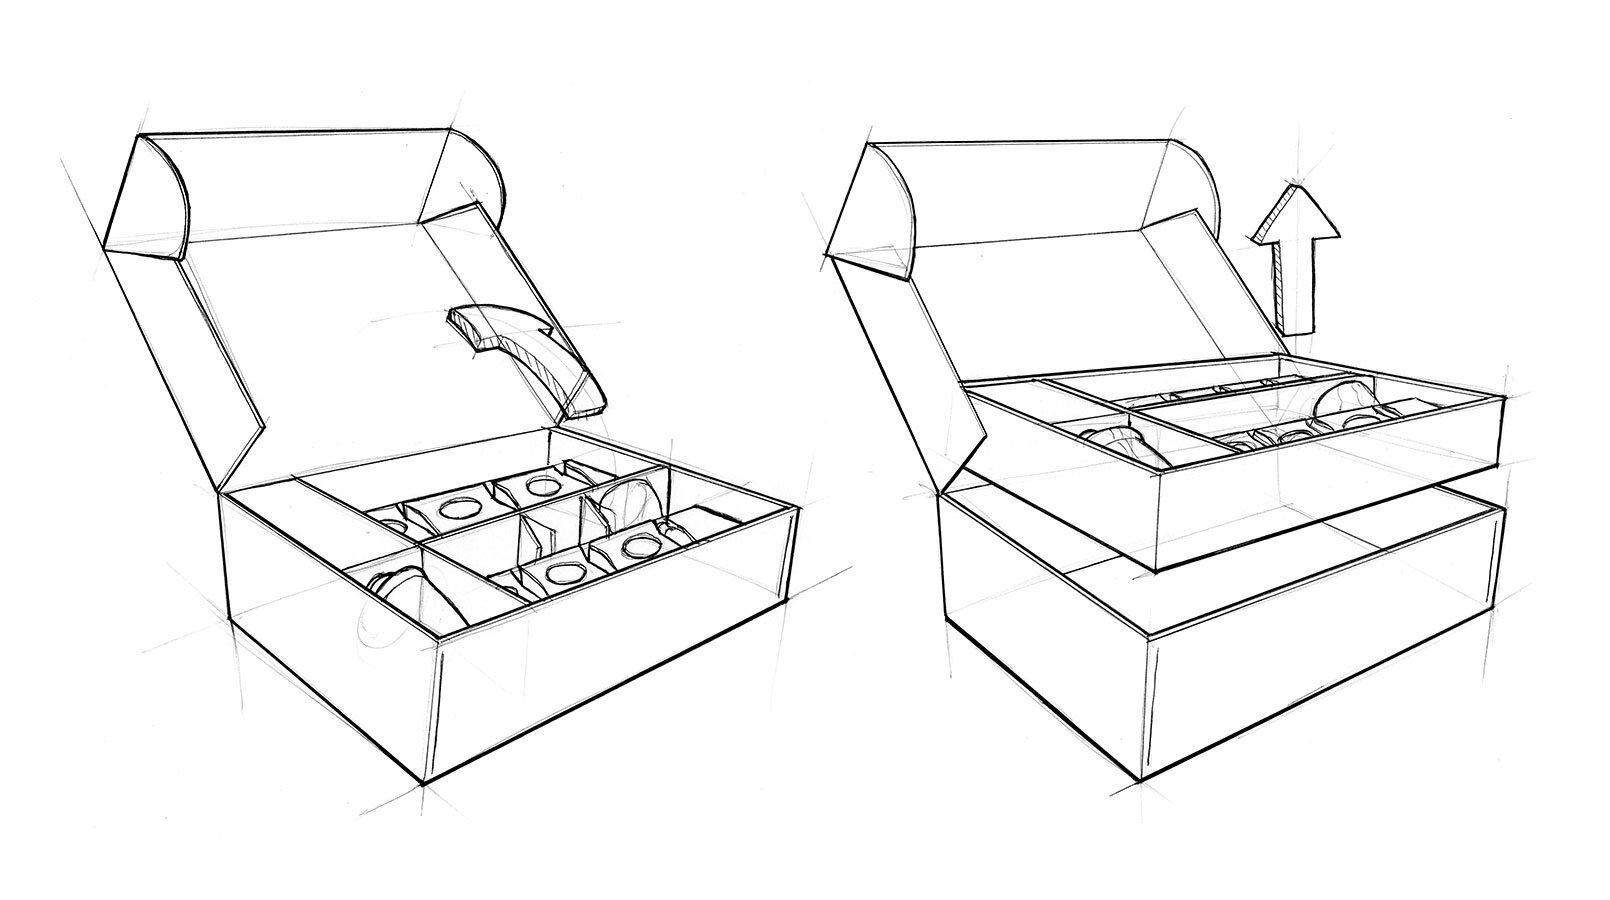 West-Elm-Box-Packaging-Company-Design-2.JPG